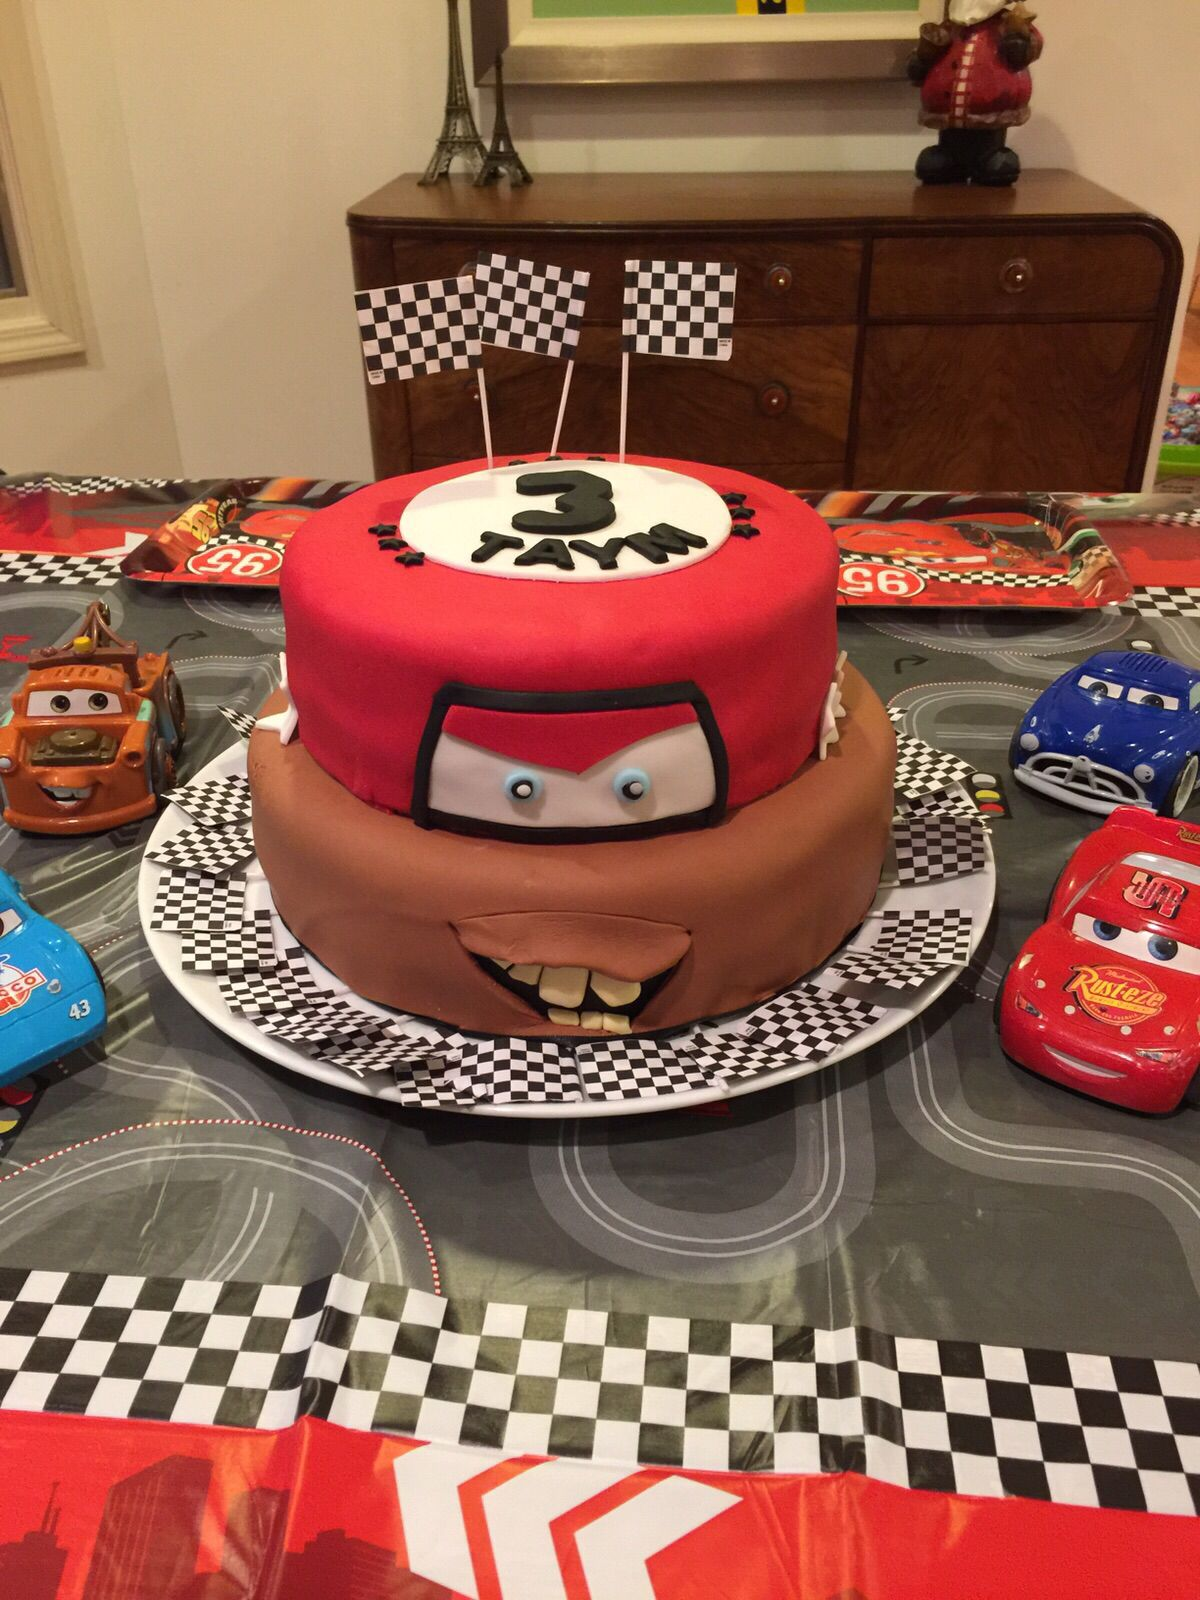 Pixar Cars Mater and Lightning Macqueen cake